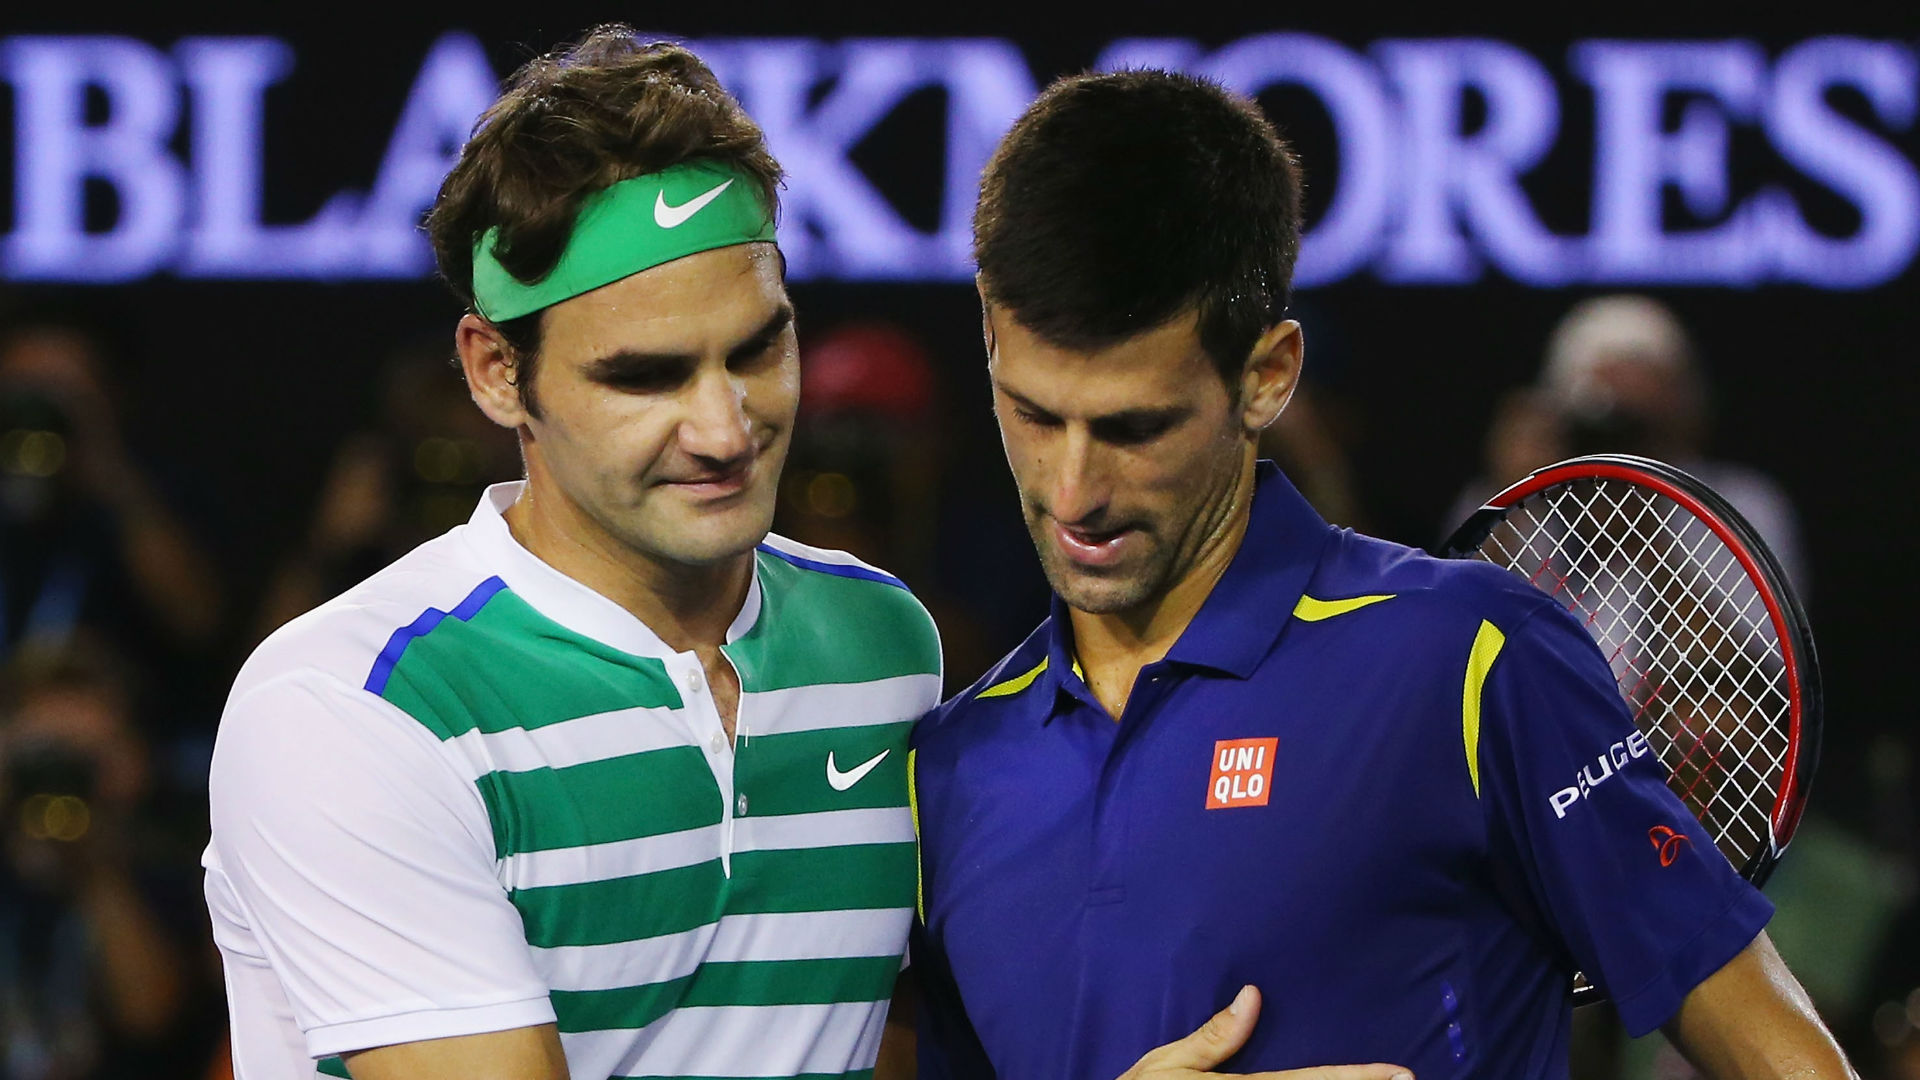 Roger Federer: Novak Djokovic could be caught up in U.S. Open pressure